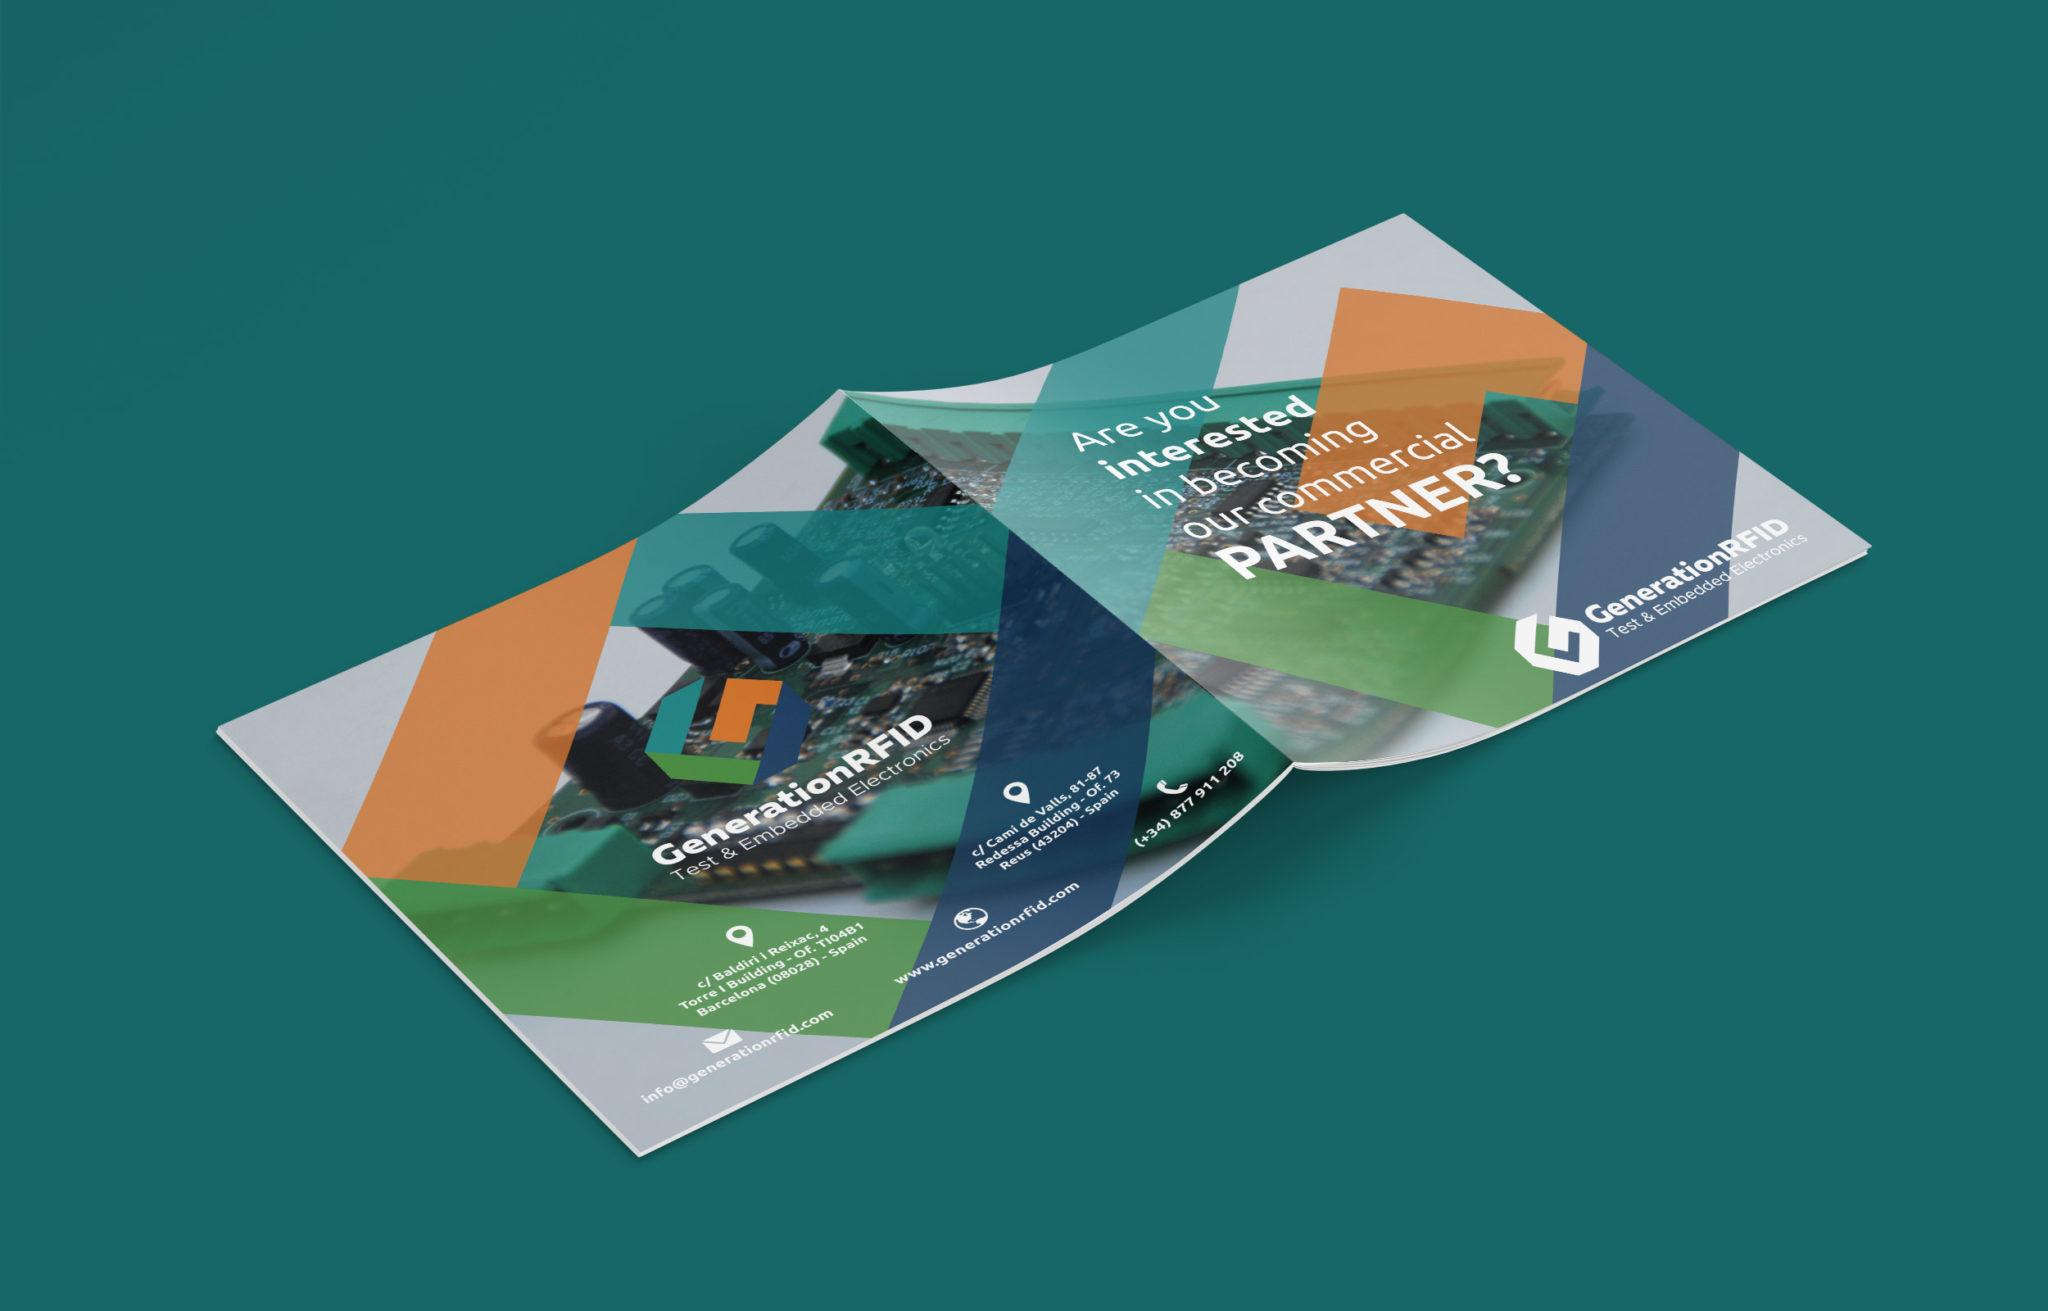 Generation-RFID-Disseny-Grafic-Test-Embedded-Electronics-Angels-Pinyol